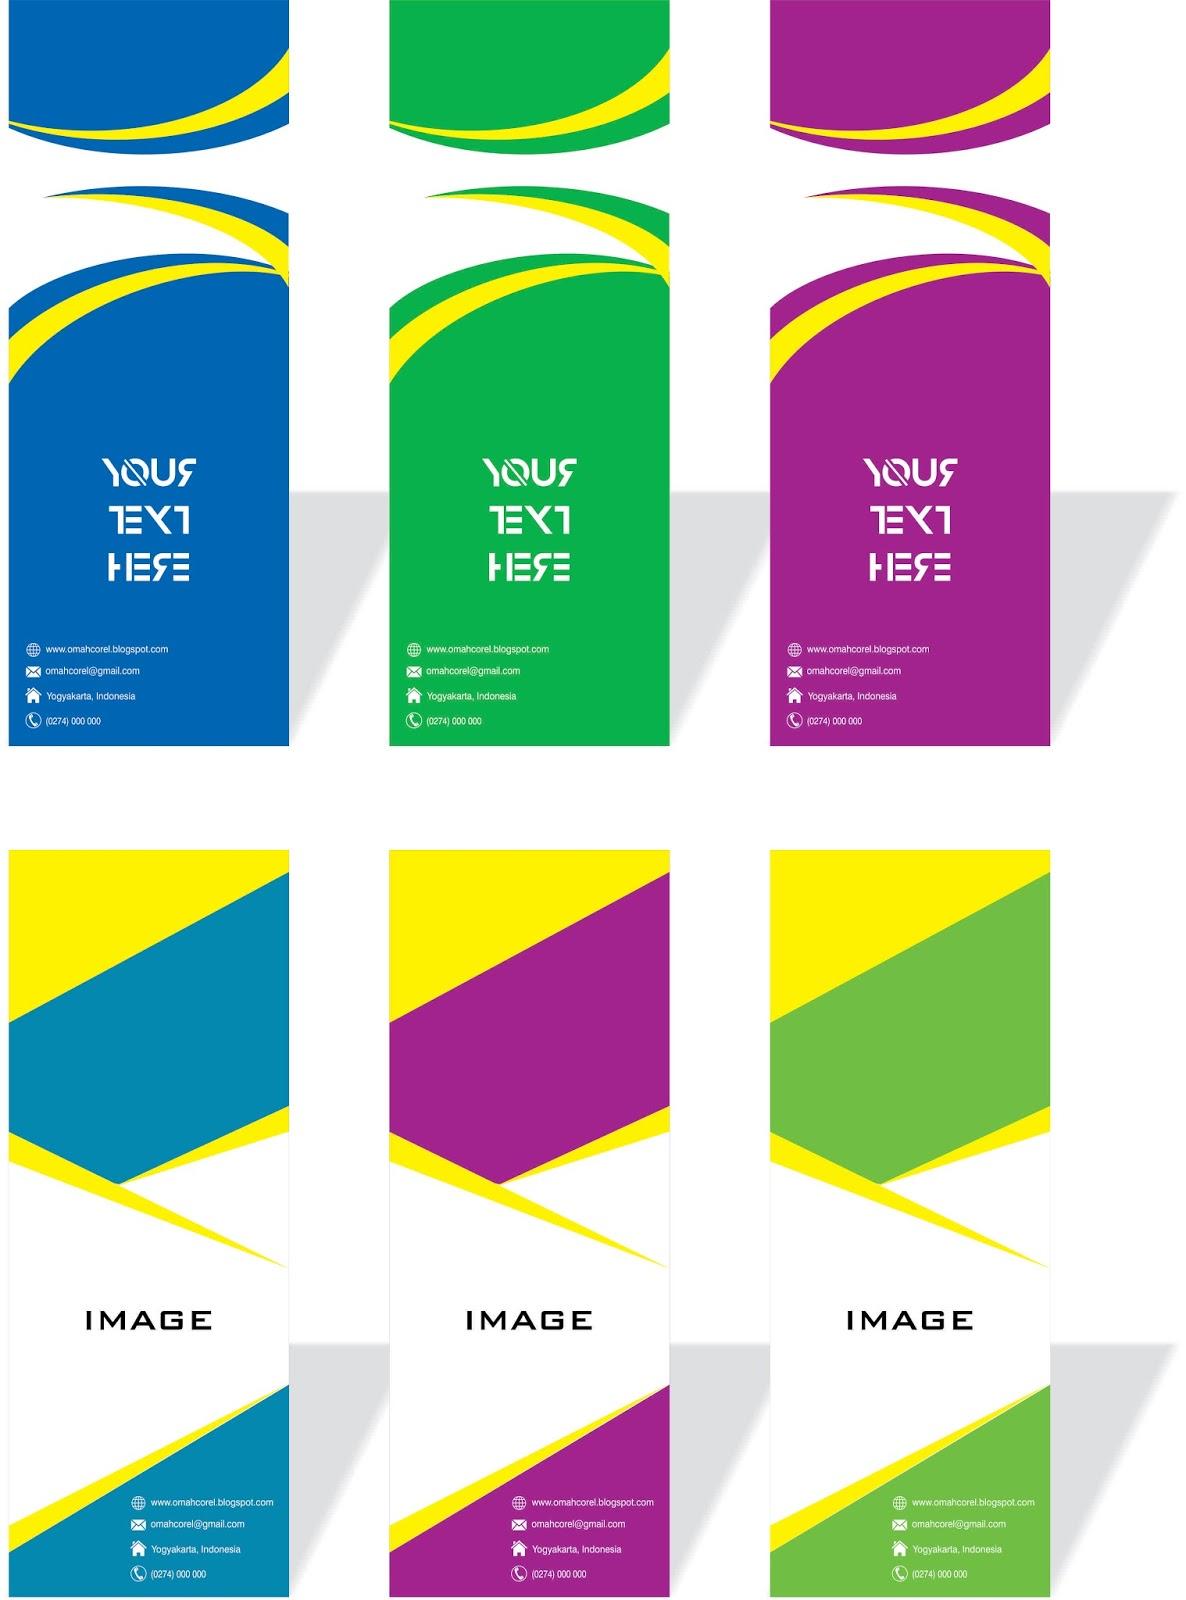 Download 10 Desain Template X Baner Keren Format Cdr - Ucorel